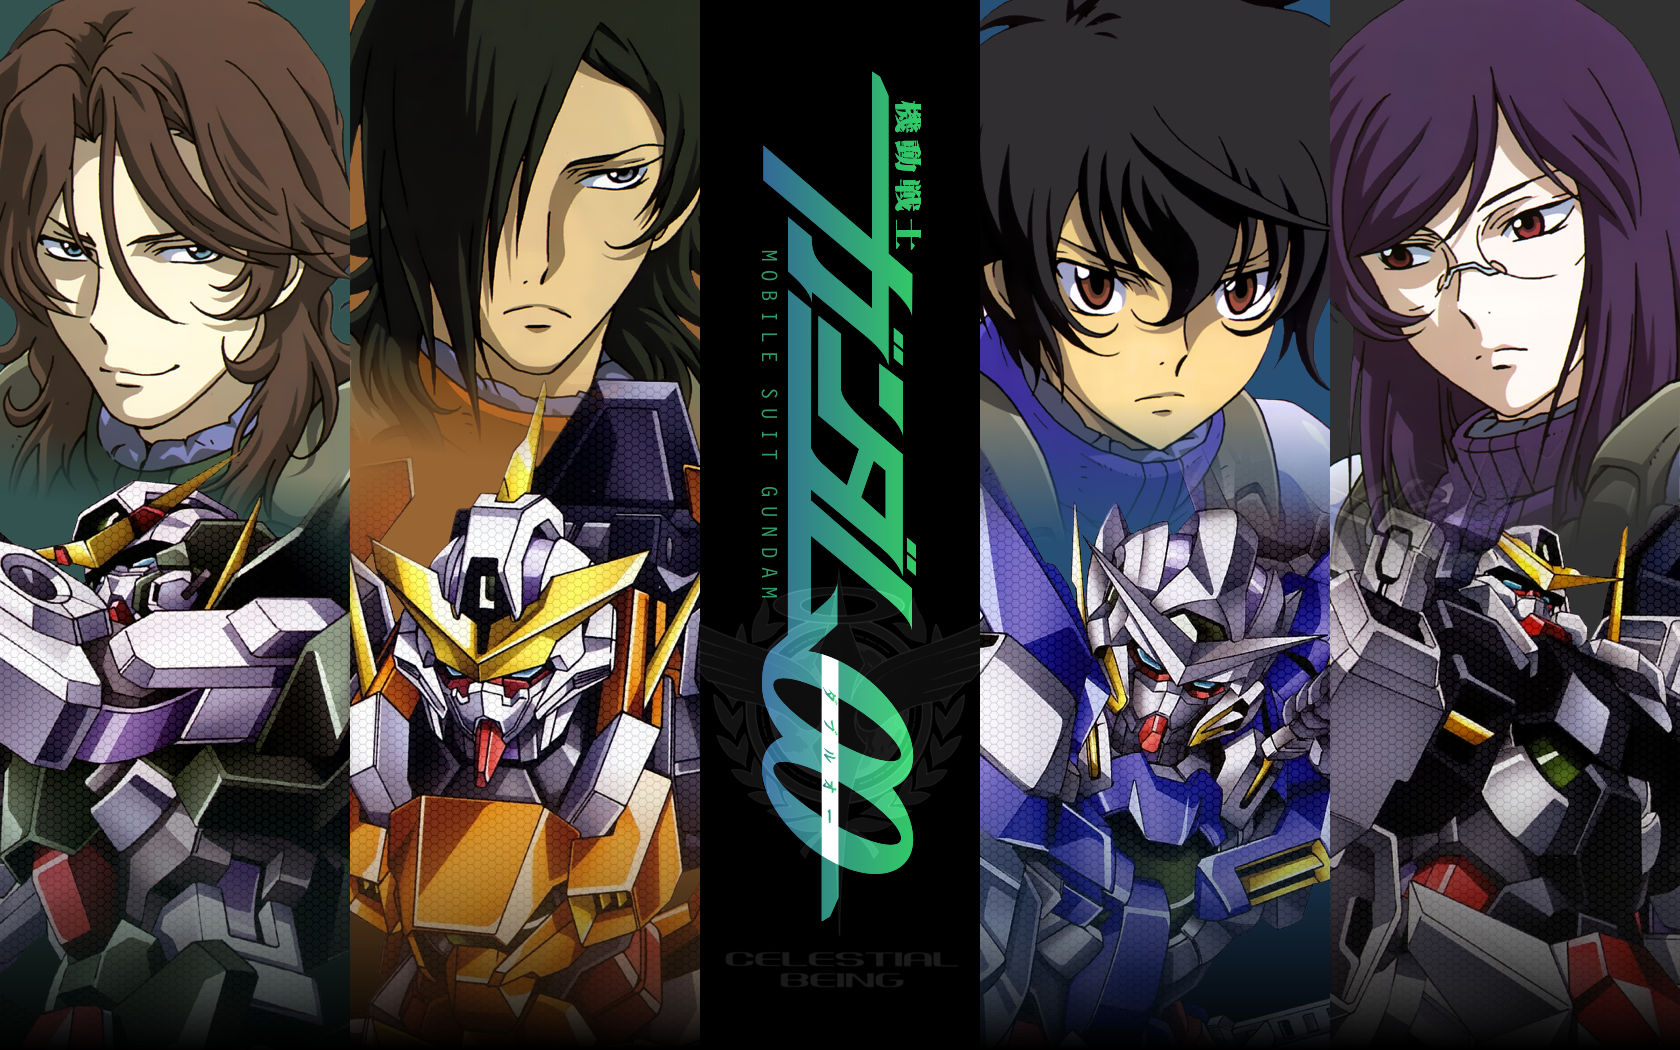 Allelujah Haptism Lockon Stratos Male Mobile Suit Gundam Mobile Suit Gundam 00 Setsuna F Seiei Tieria Erde Konachan Com Konachan Com Anime Wallpapers